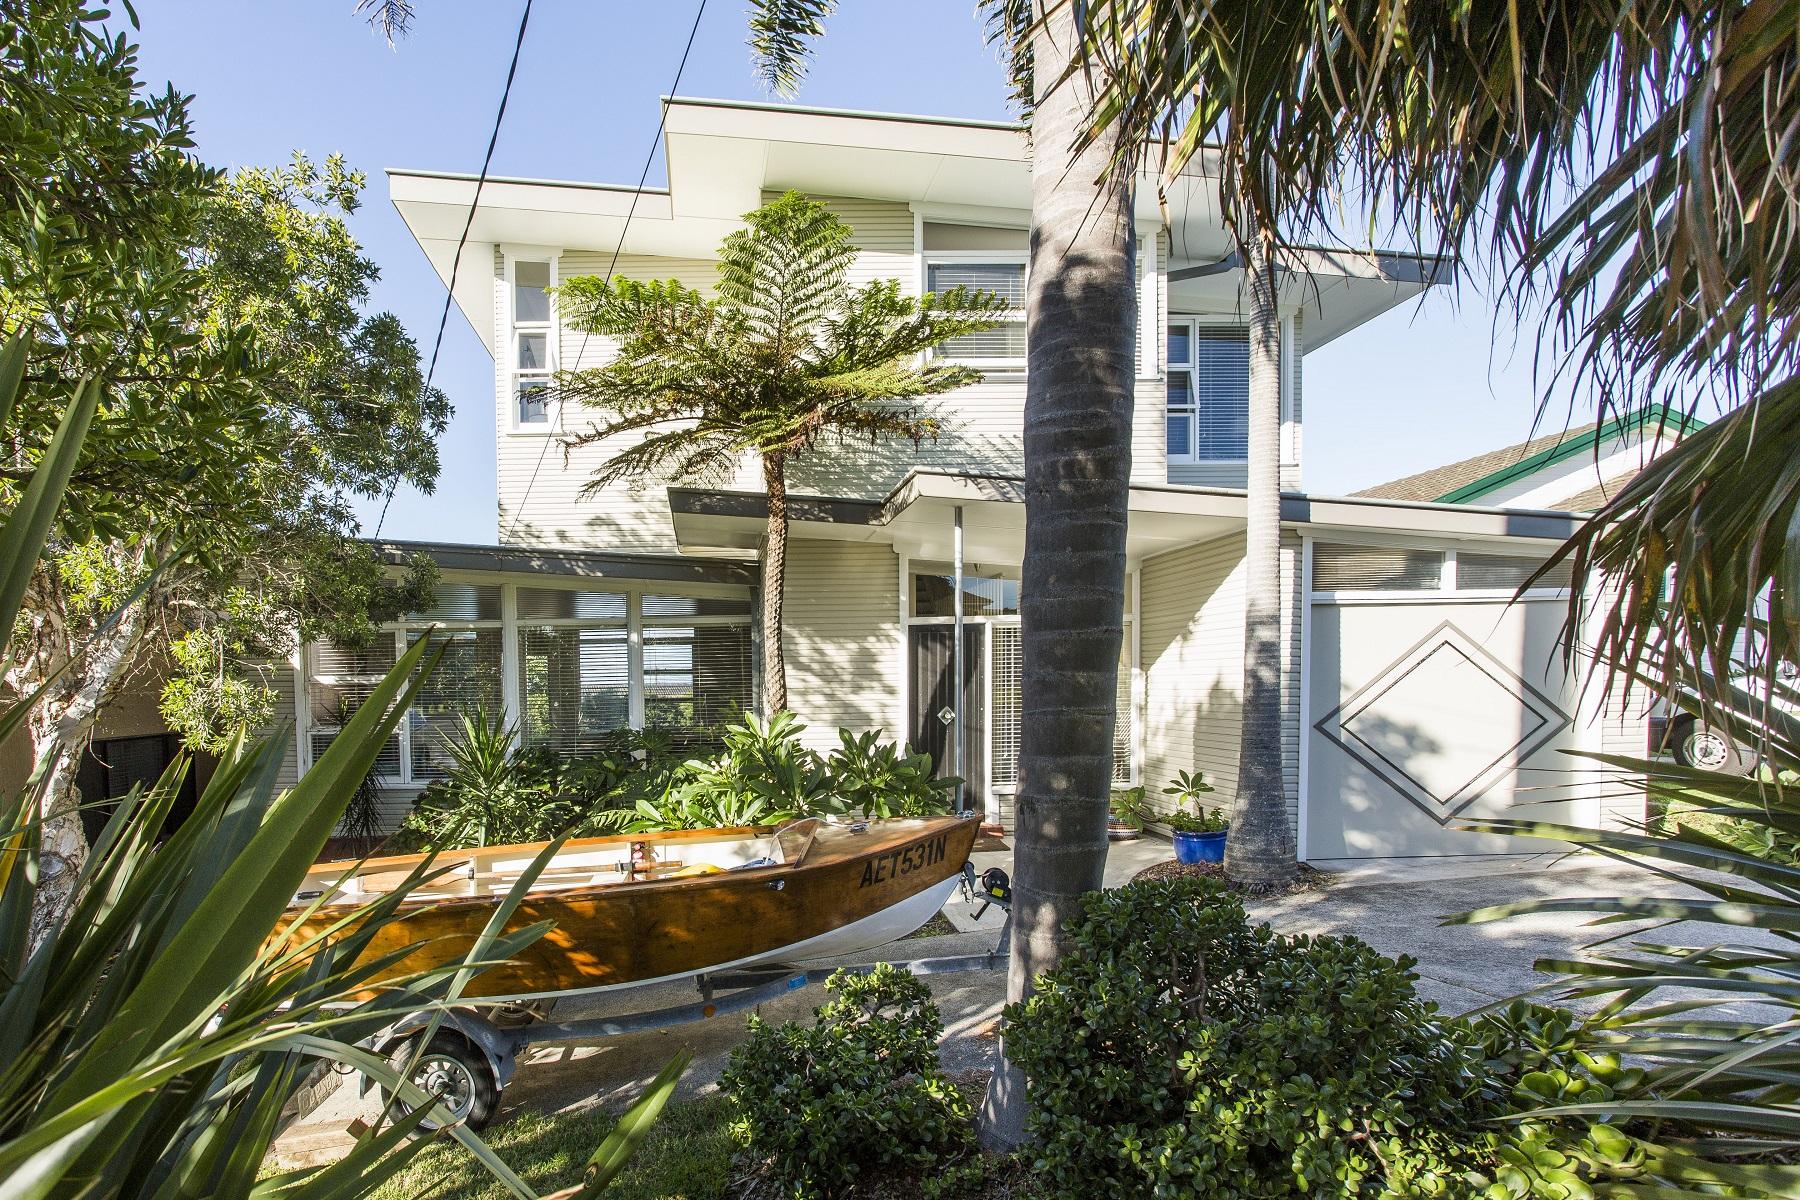 1970s-Beach-House-Kiama-Michael-Bell-Architects-Sydney